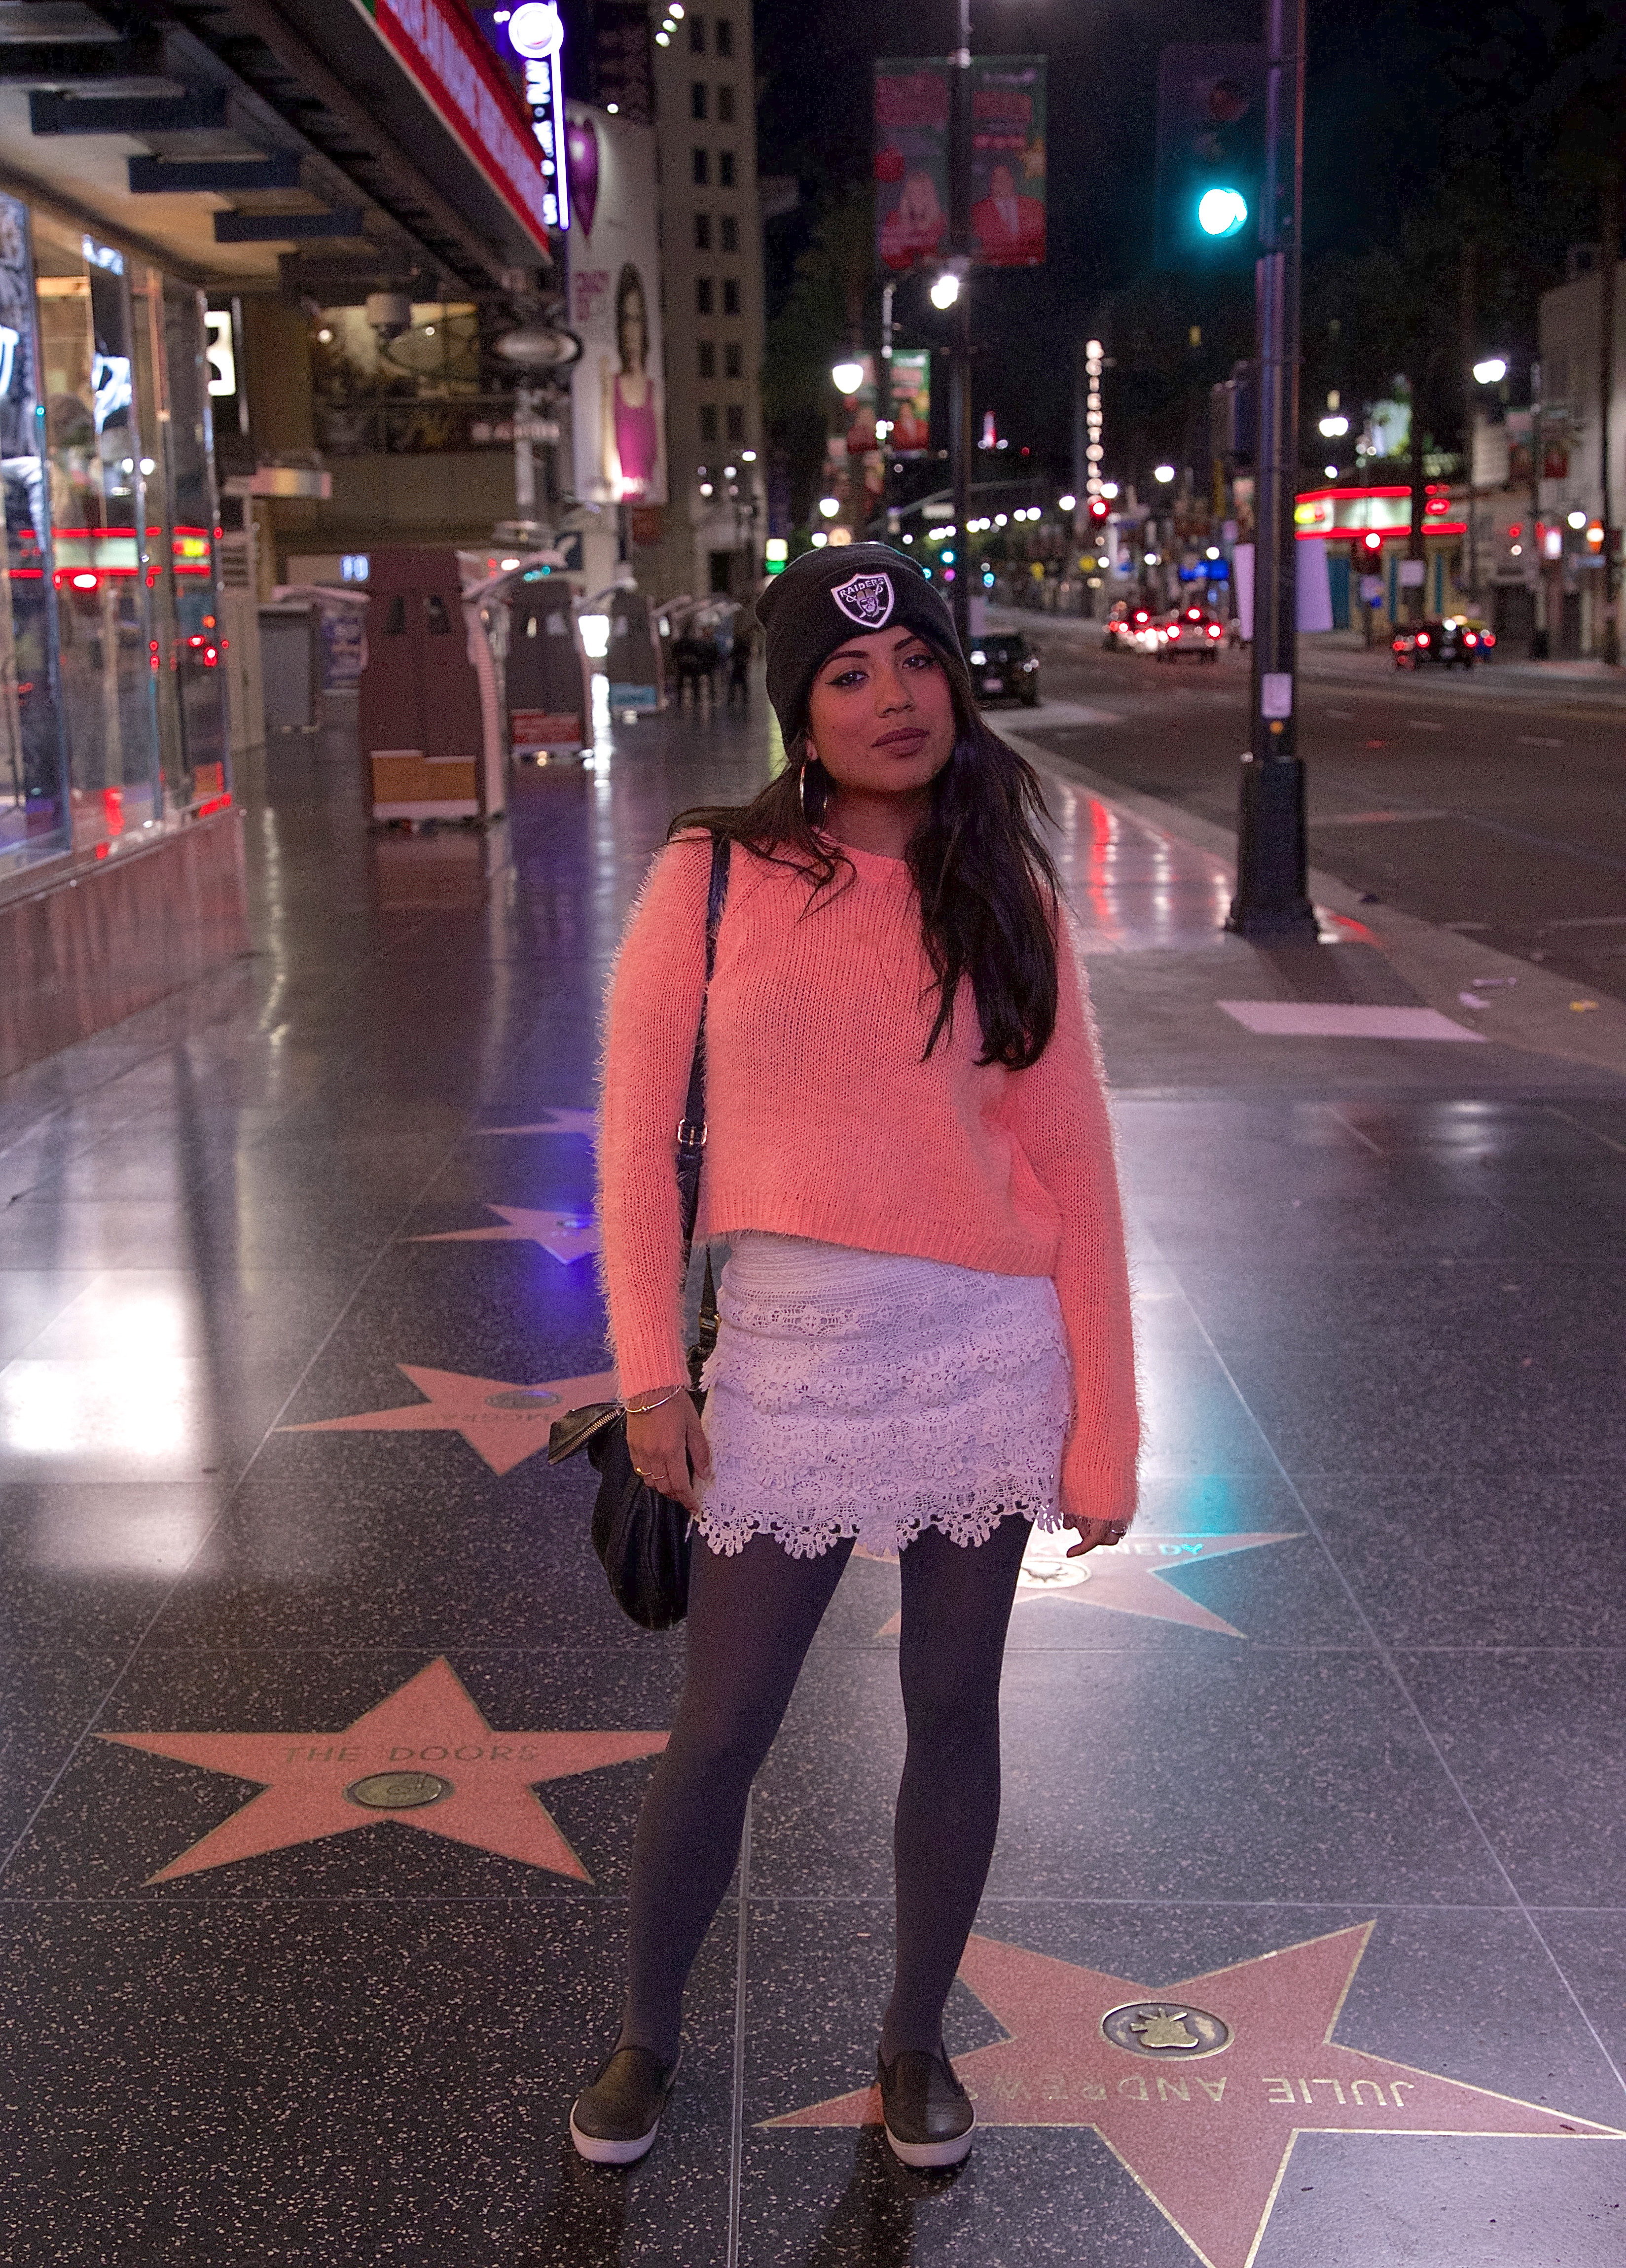 14. Hollywood Boulevard